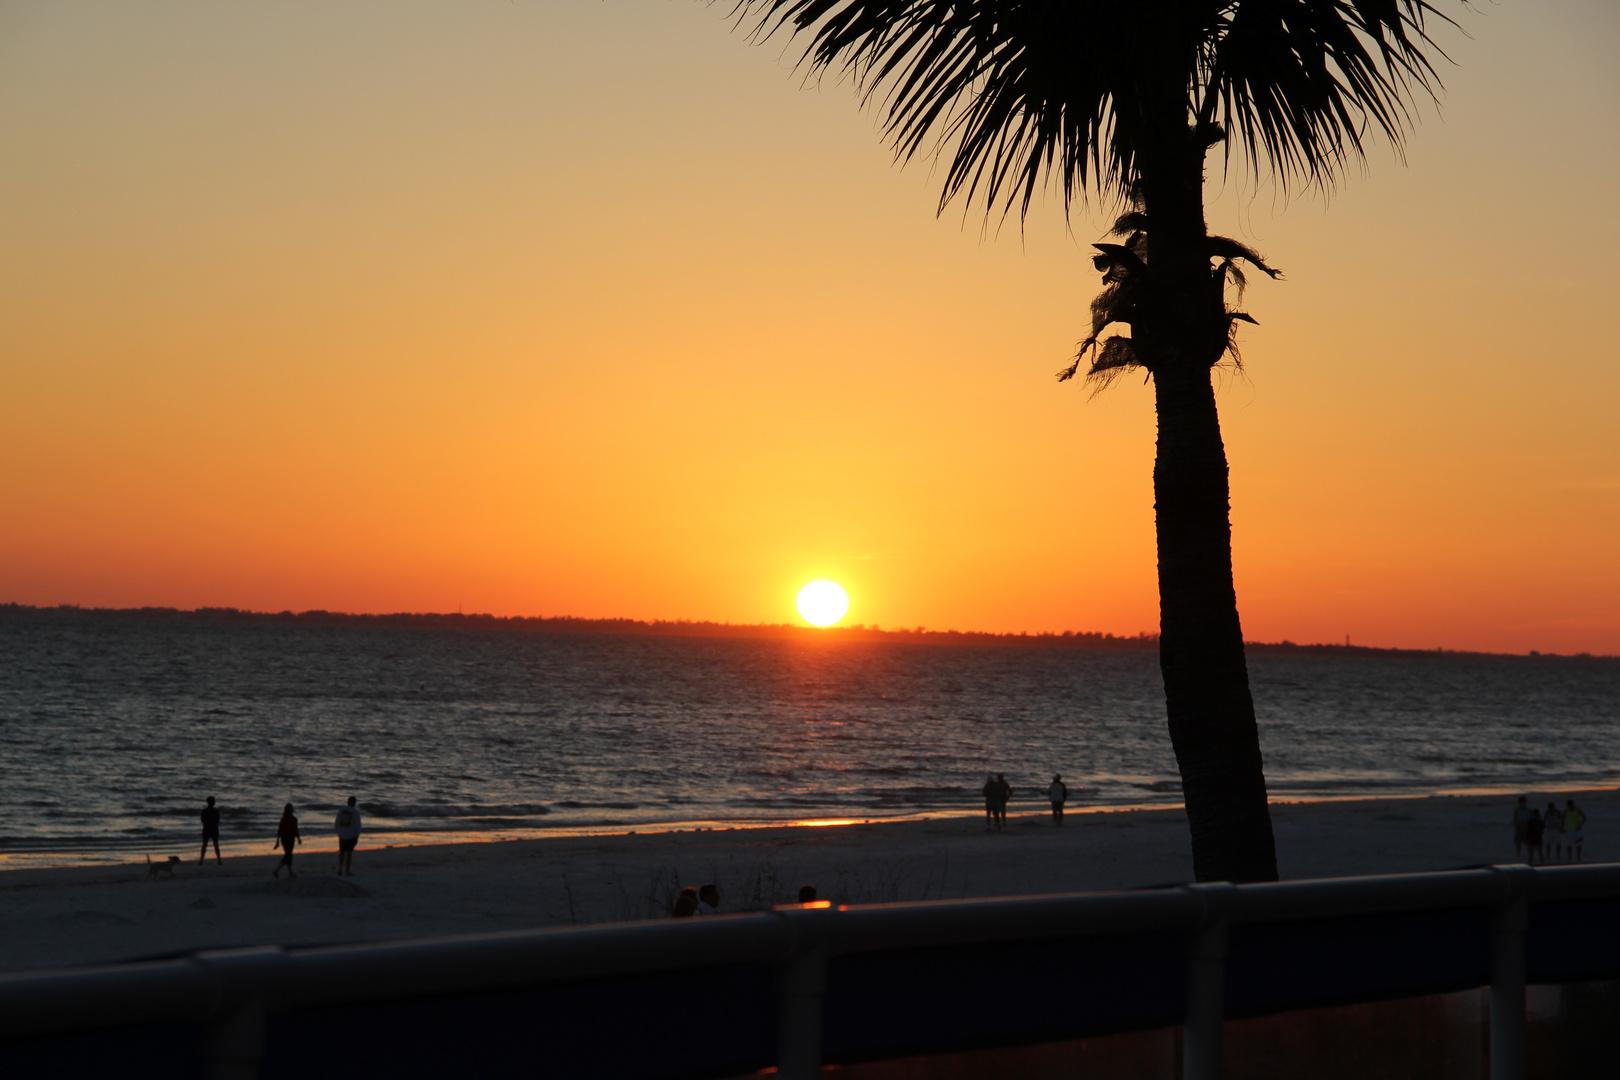 Fort Myers Beach II, USA (FL)